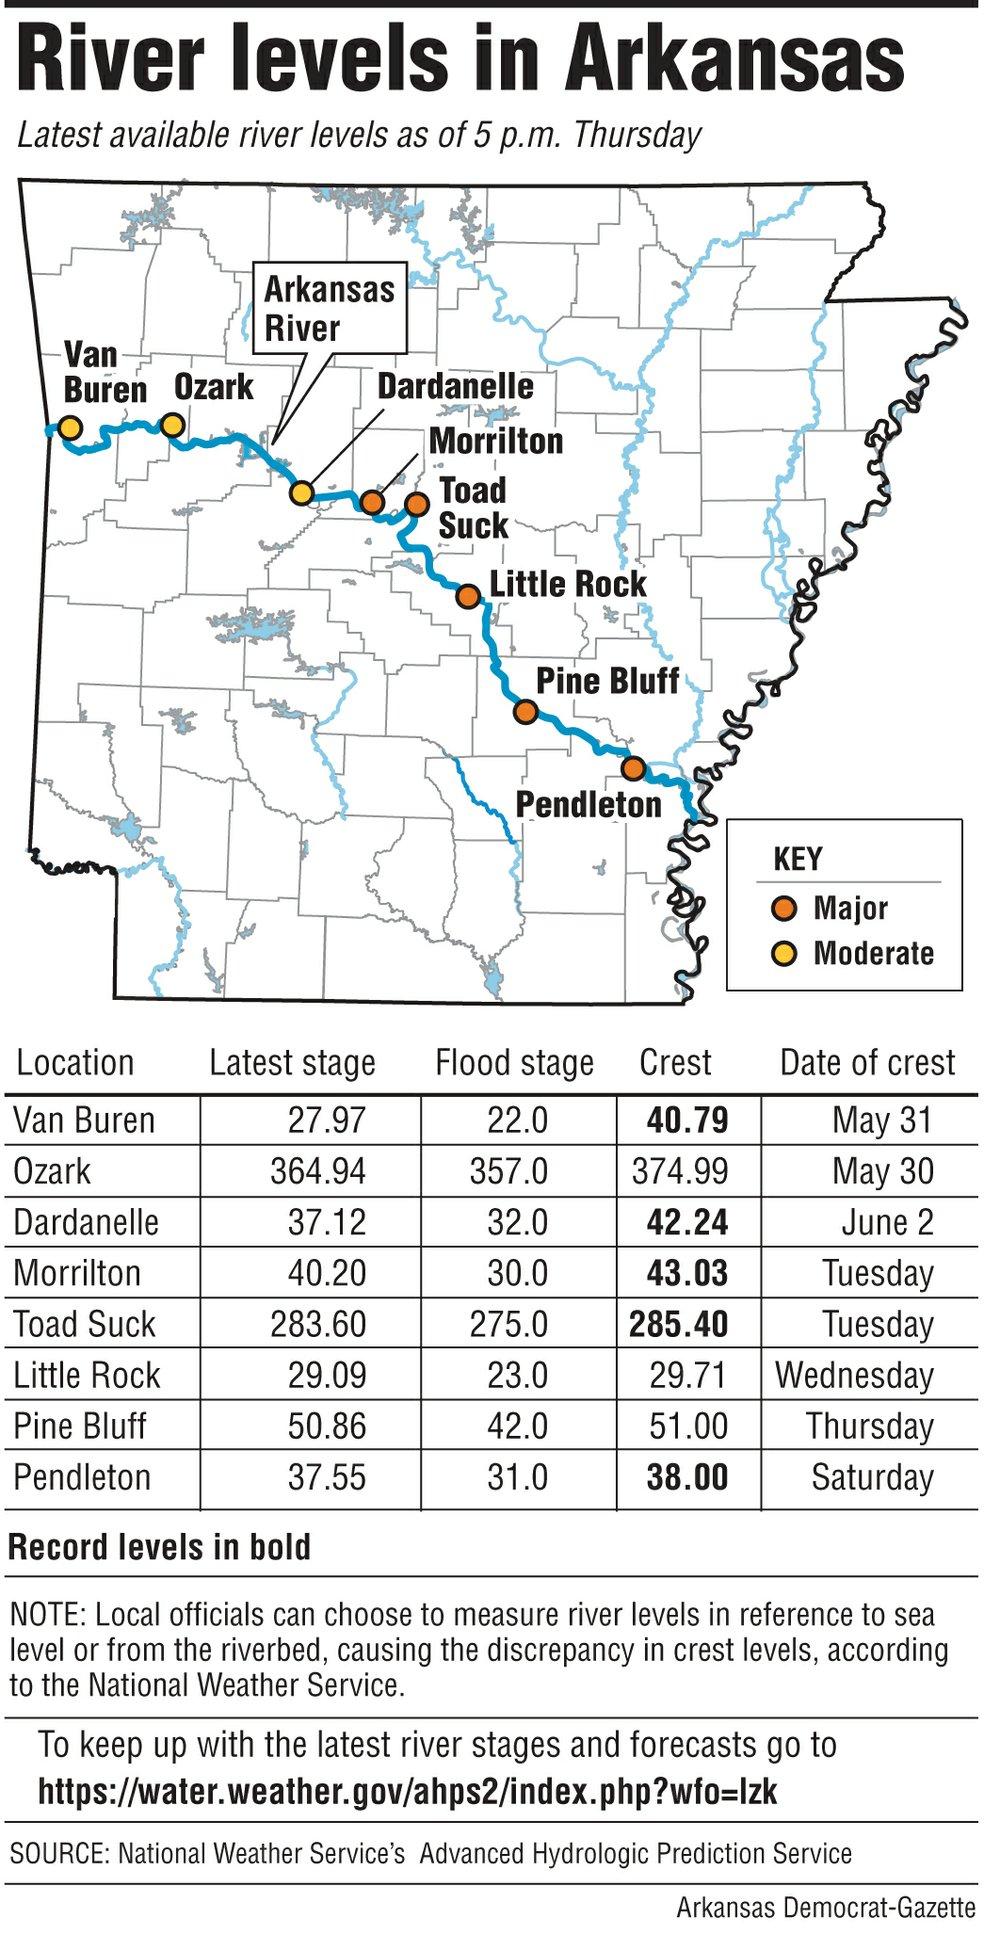 River levels in Arkansas